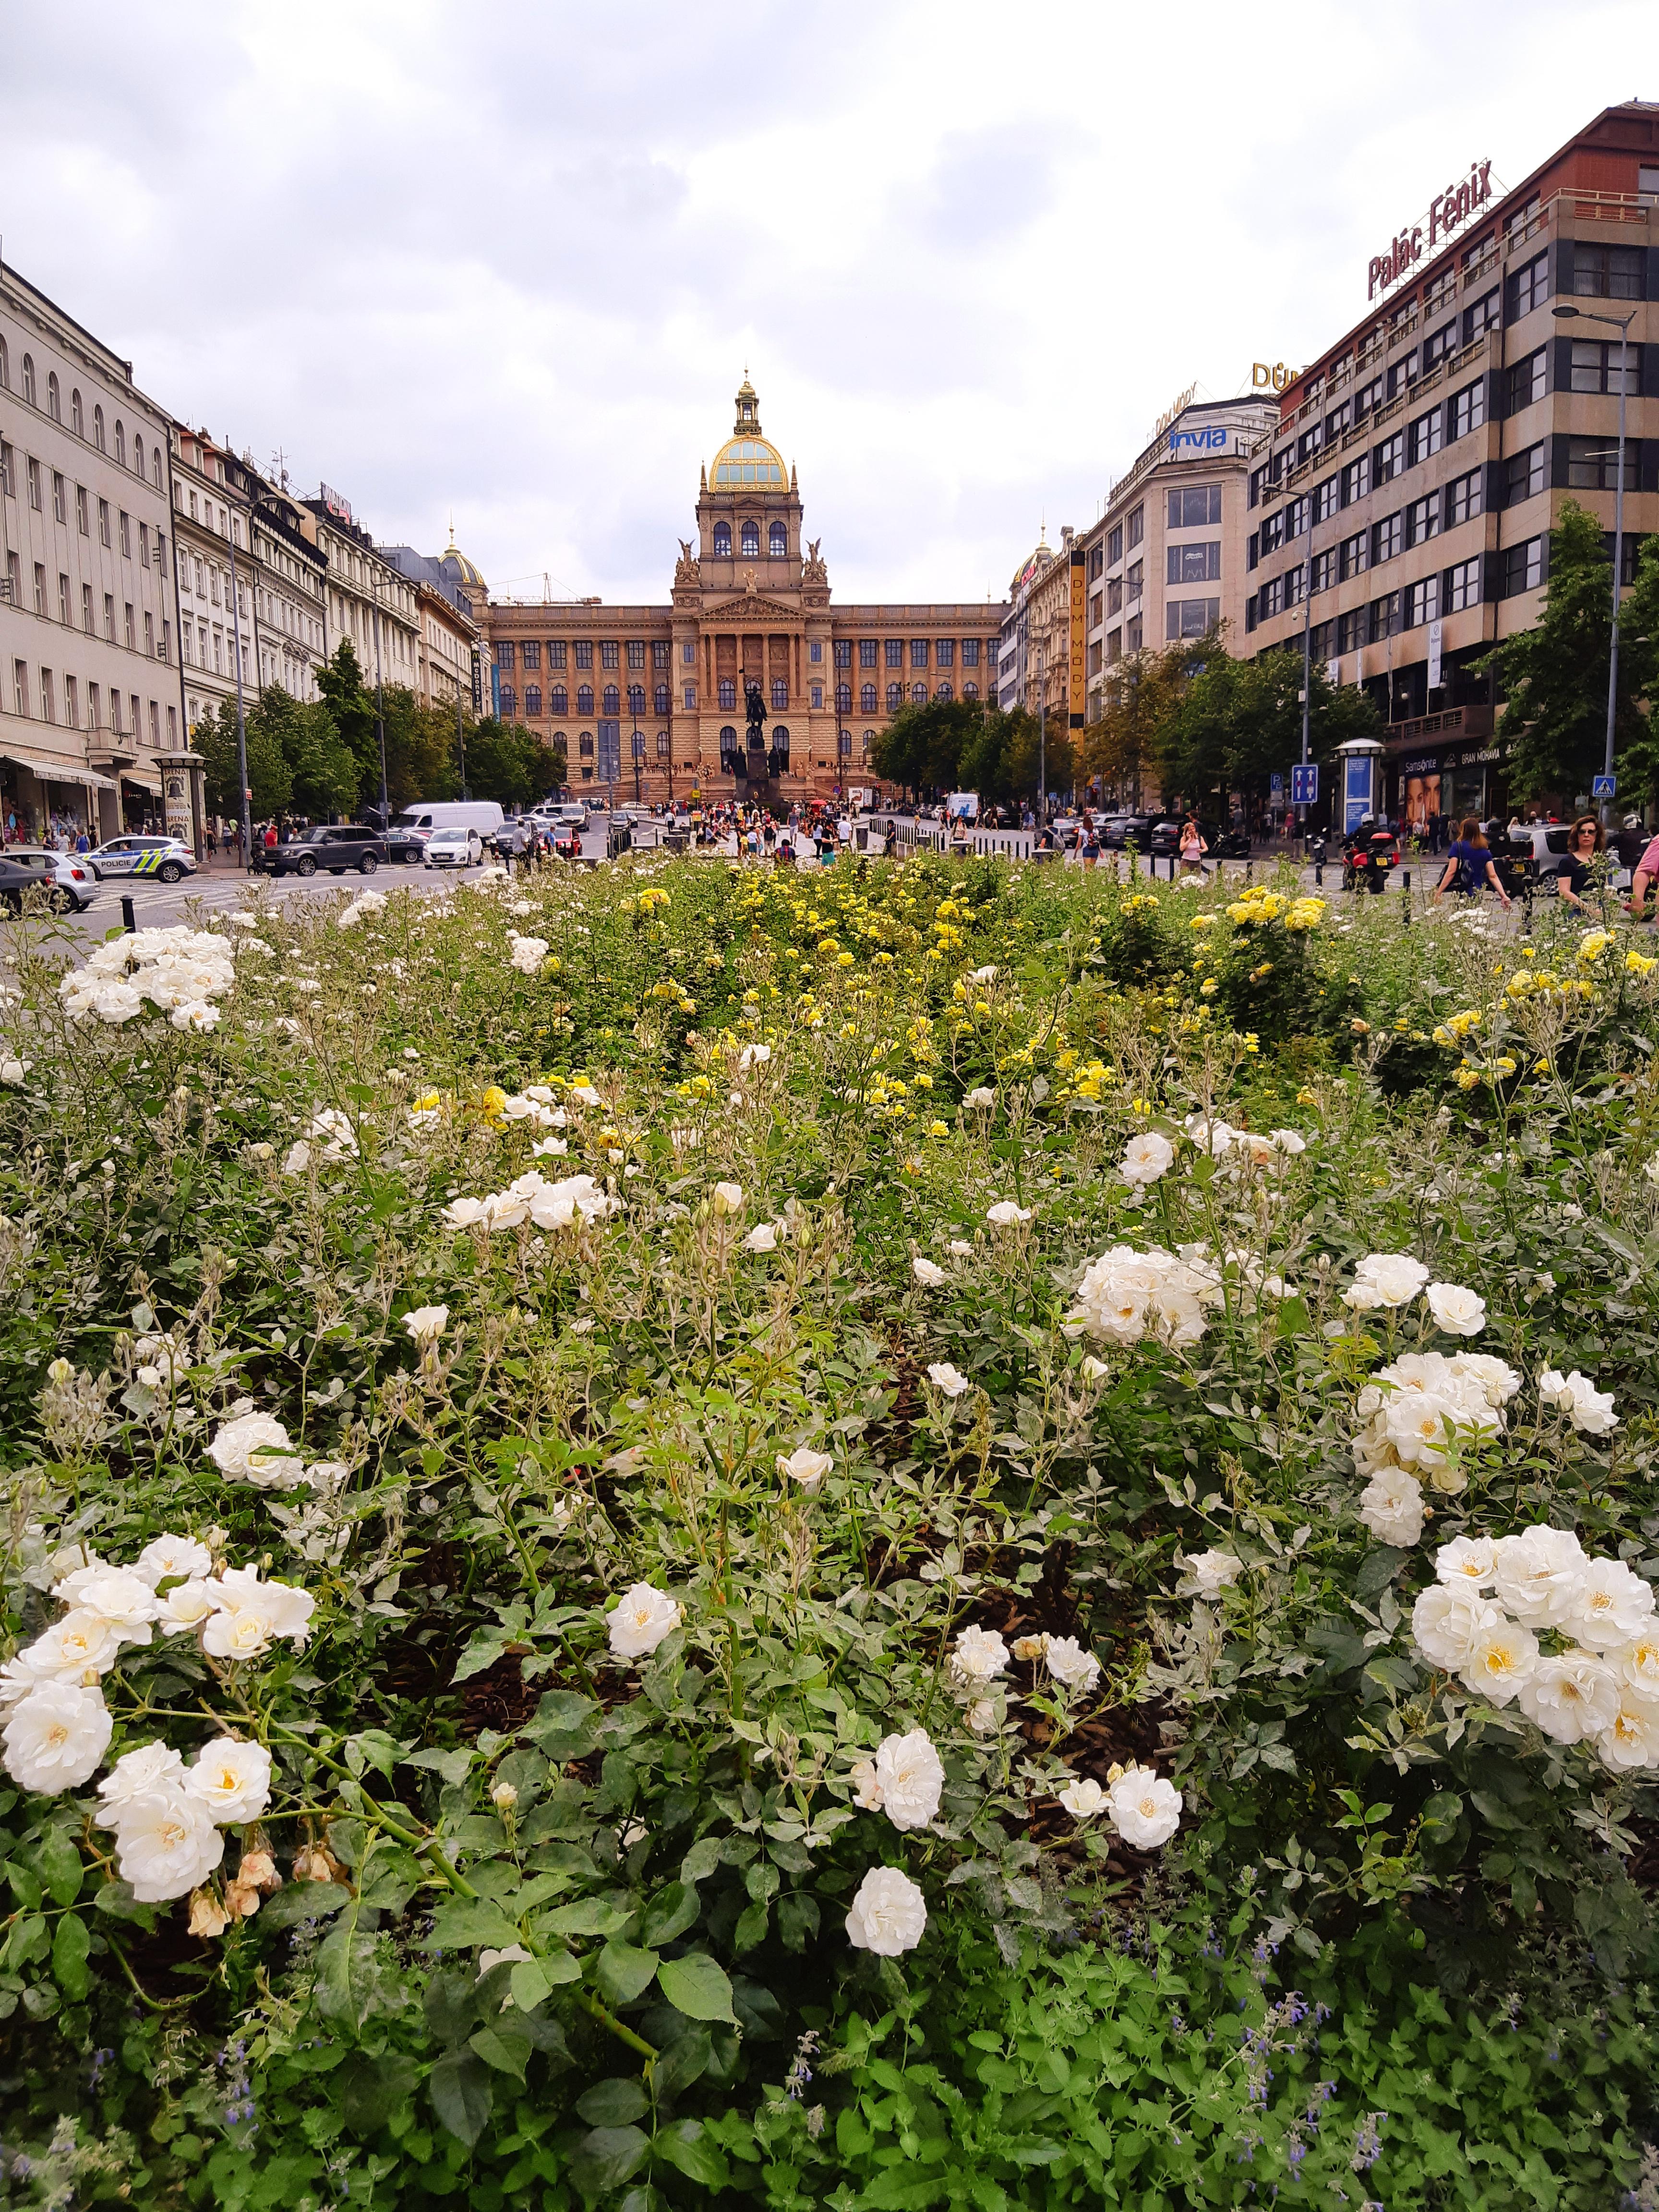 Piazza Venceslao Praga.jpeg